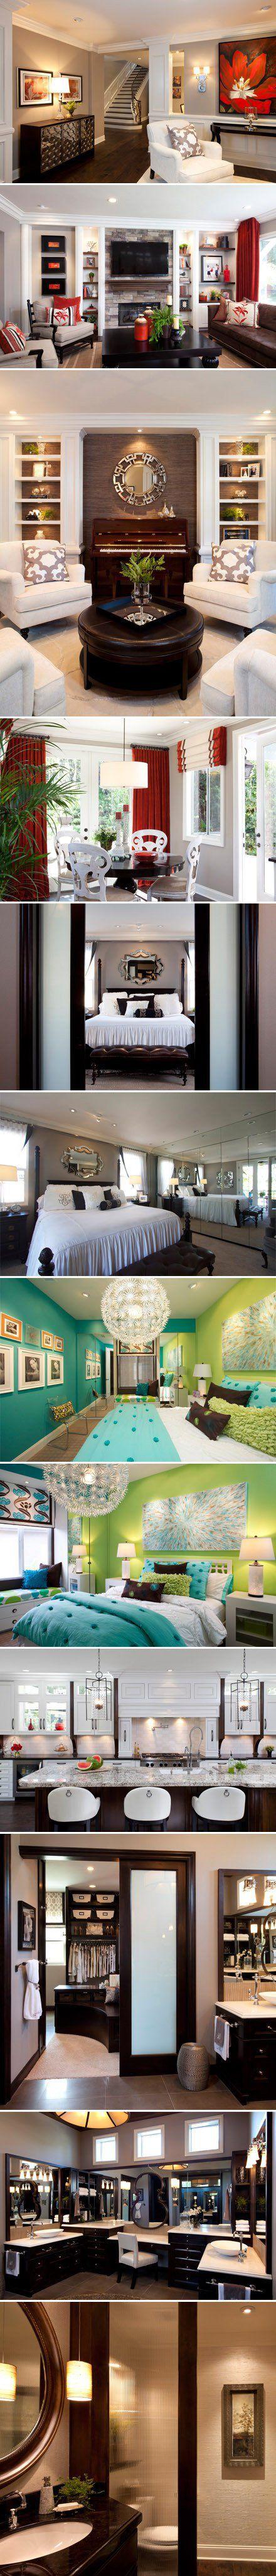 47 Best Robeson Design Images Robeson Design Design House Design #robeson #design #living #room